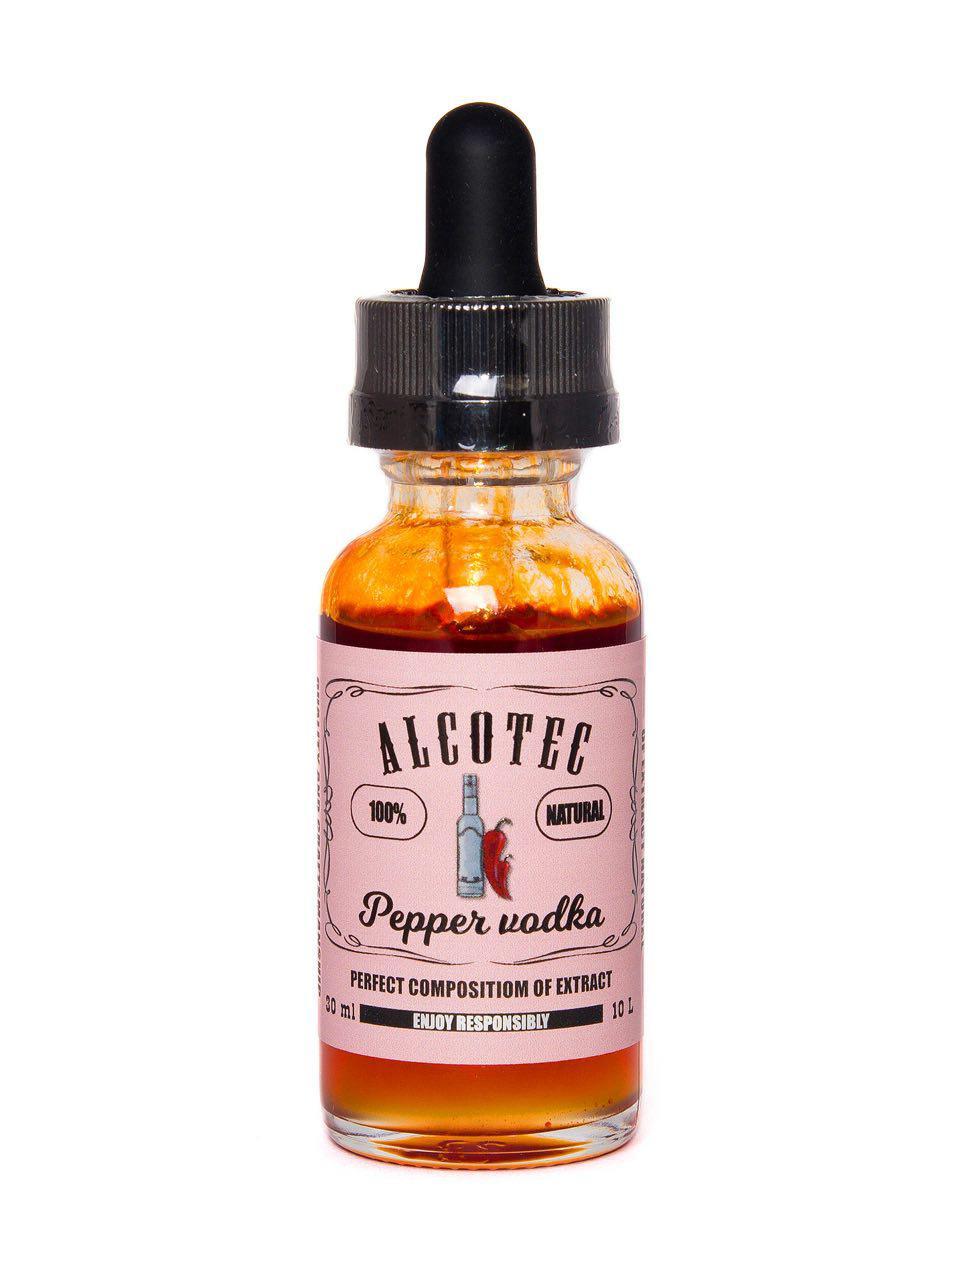 Натуральная эссенция Alcotec (Alcostar) Pepper vodka